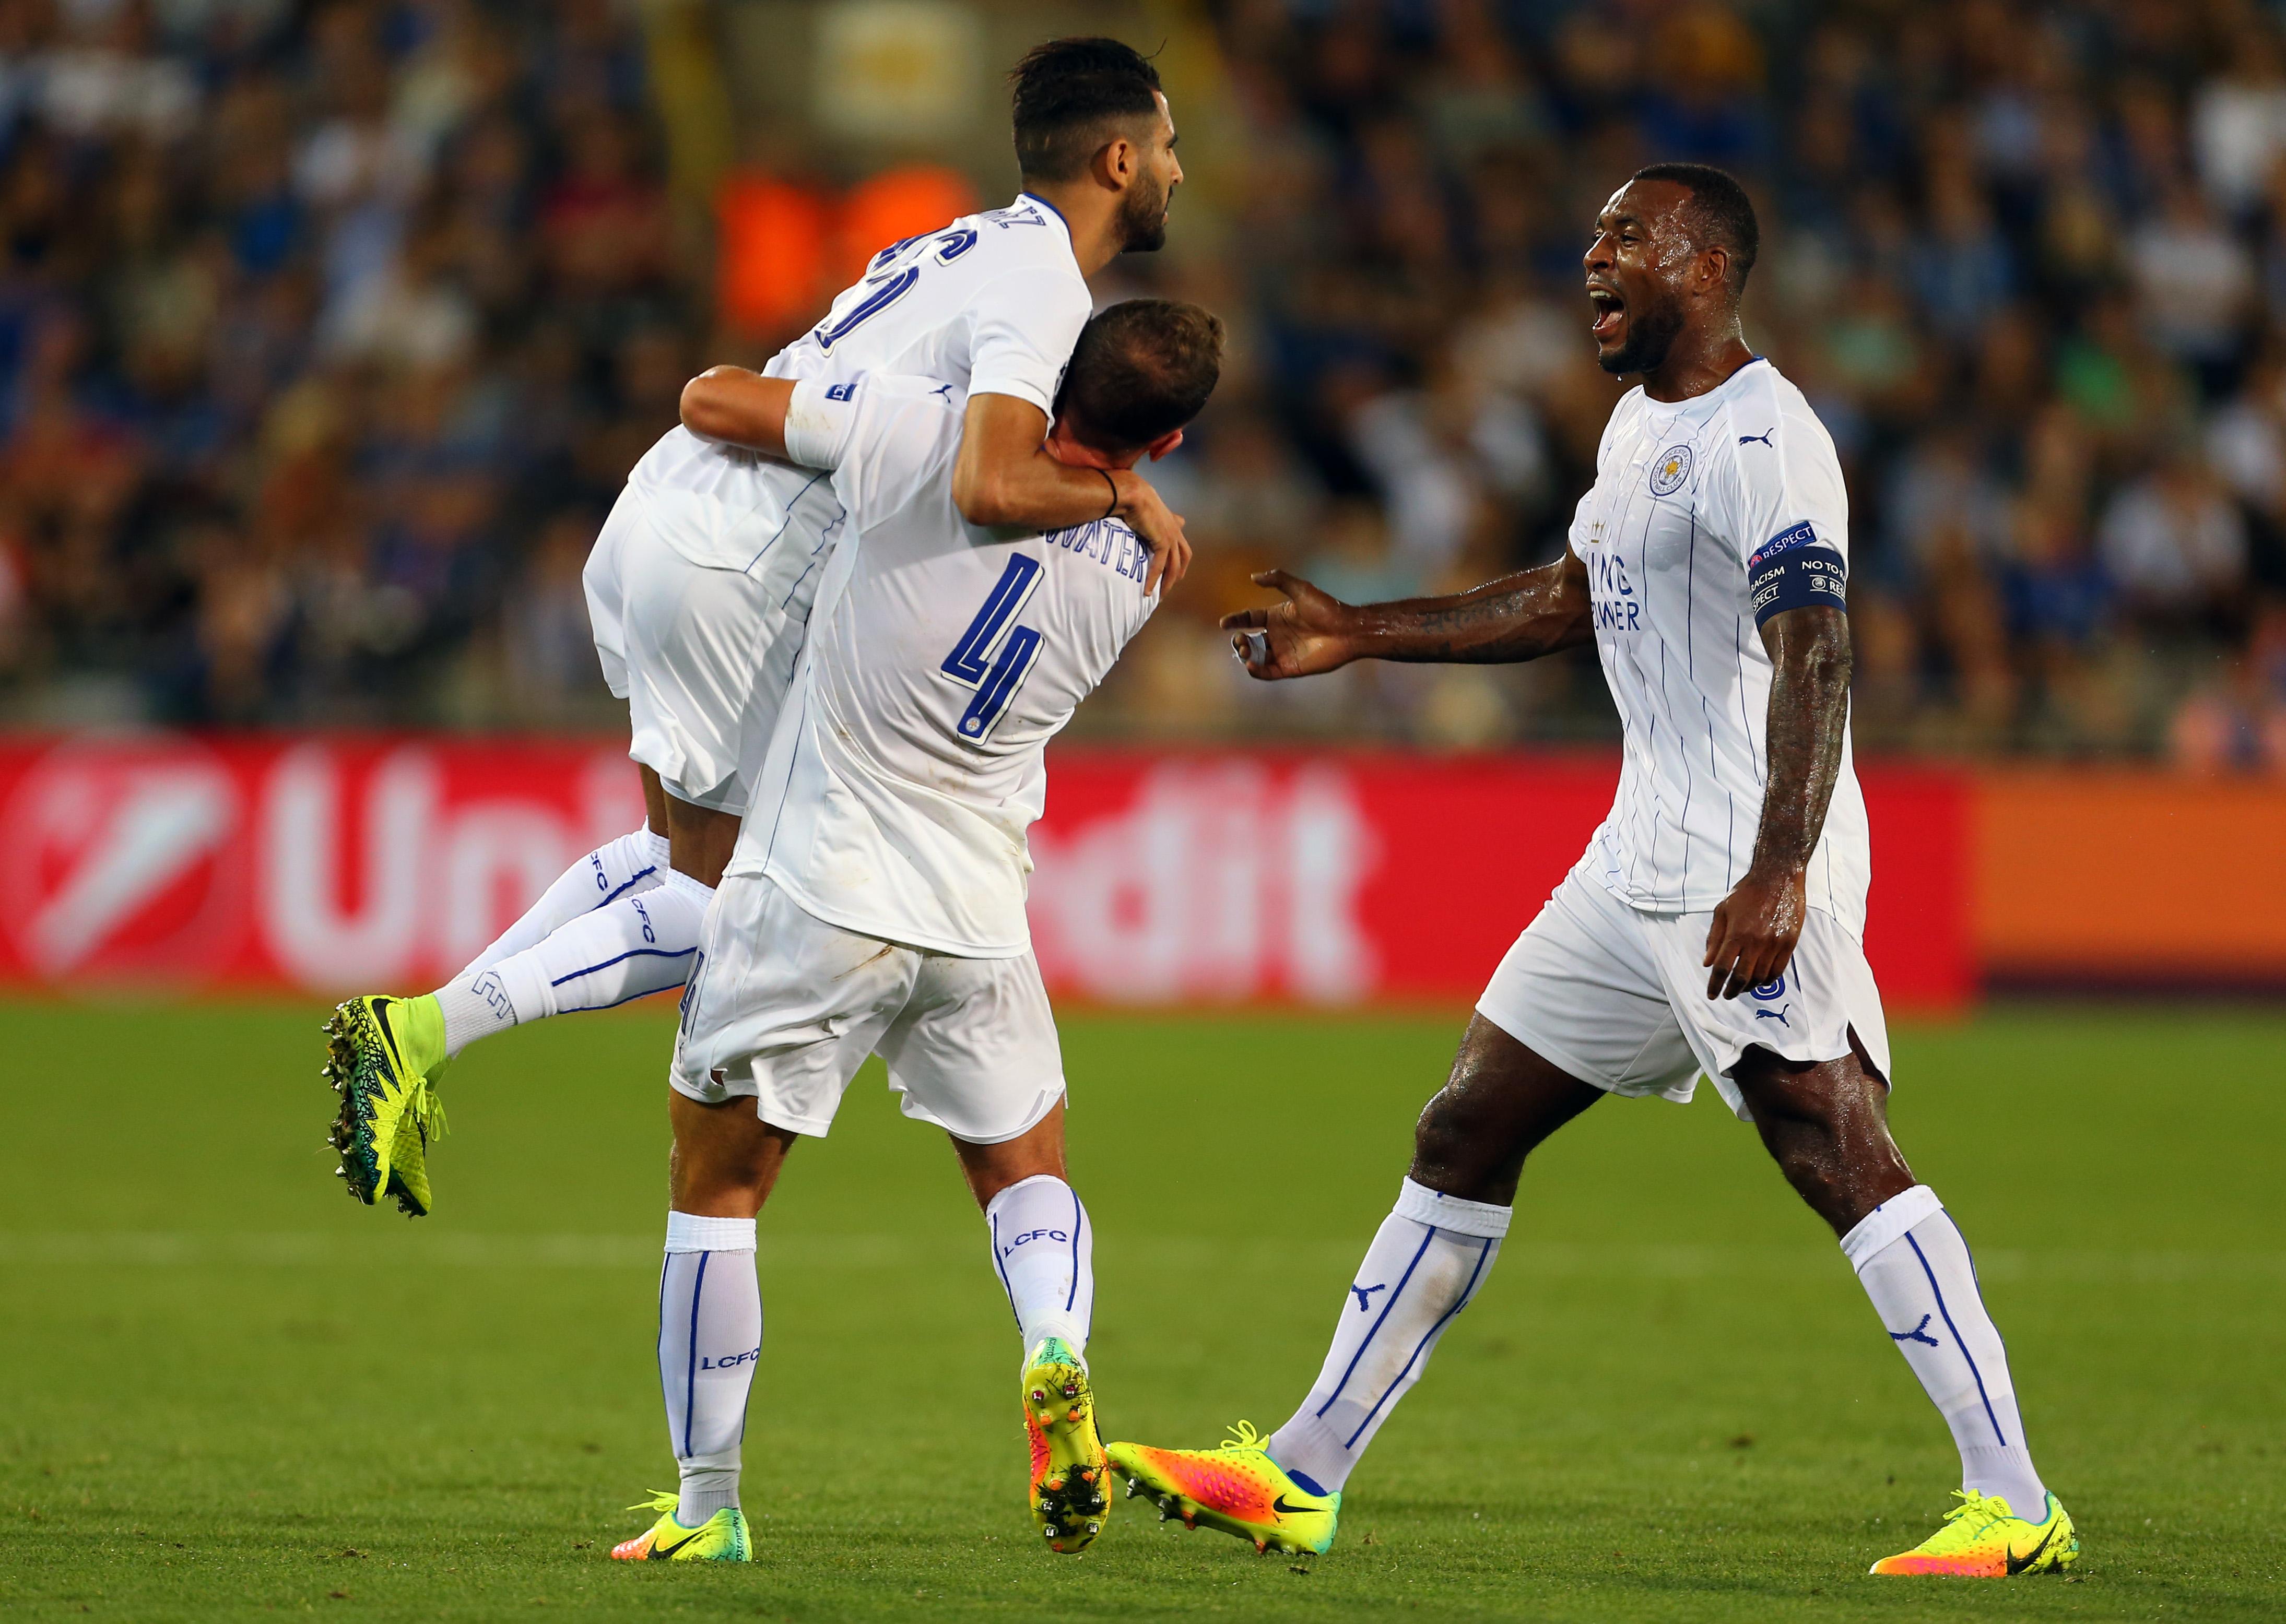 UCL: Leicester stars Albrighton, Drinkwater, Mahrez and Vardy shine